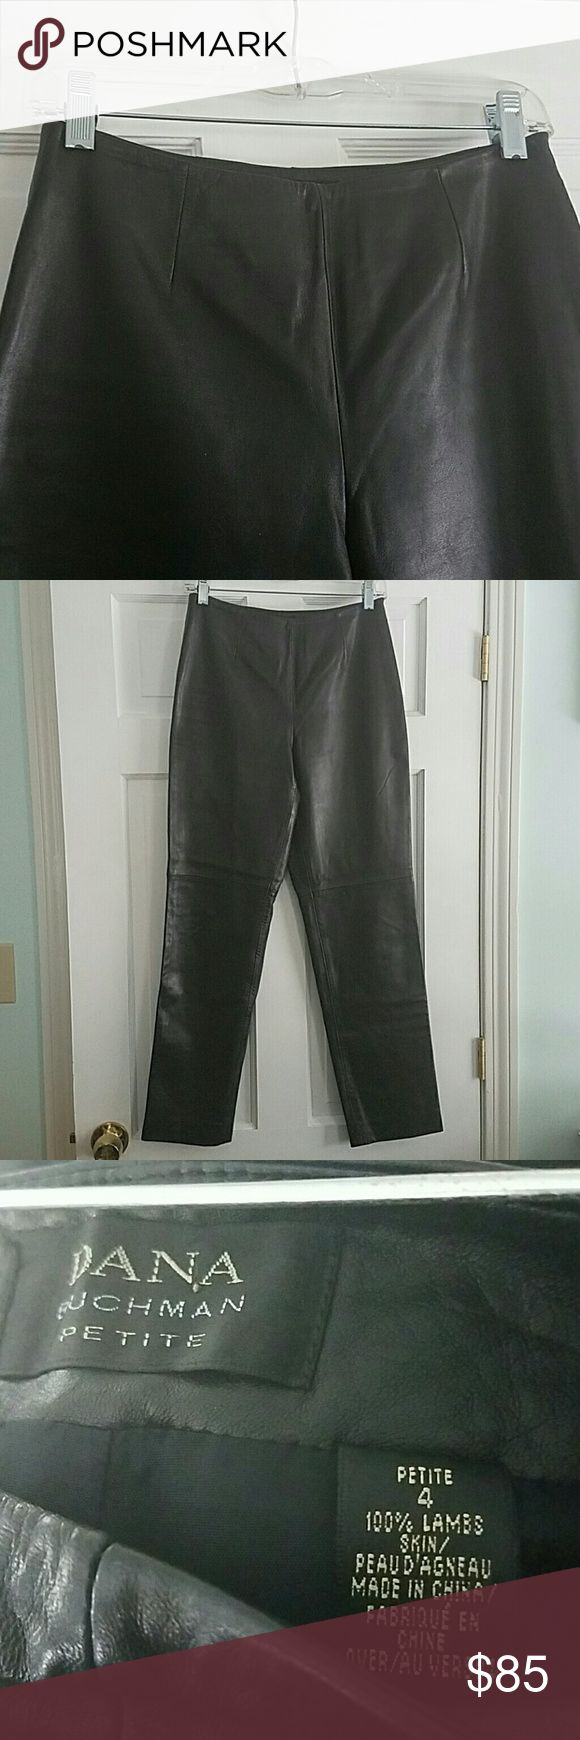 100% Leather pants Excellent condtion. Dana Buchman petite size 4 black leather pants. Dana Buchman Pants